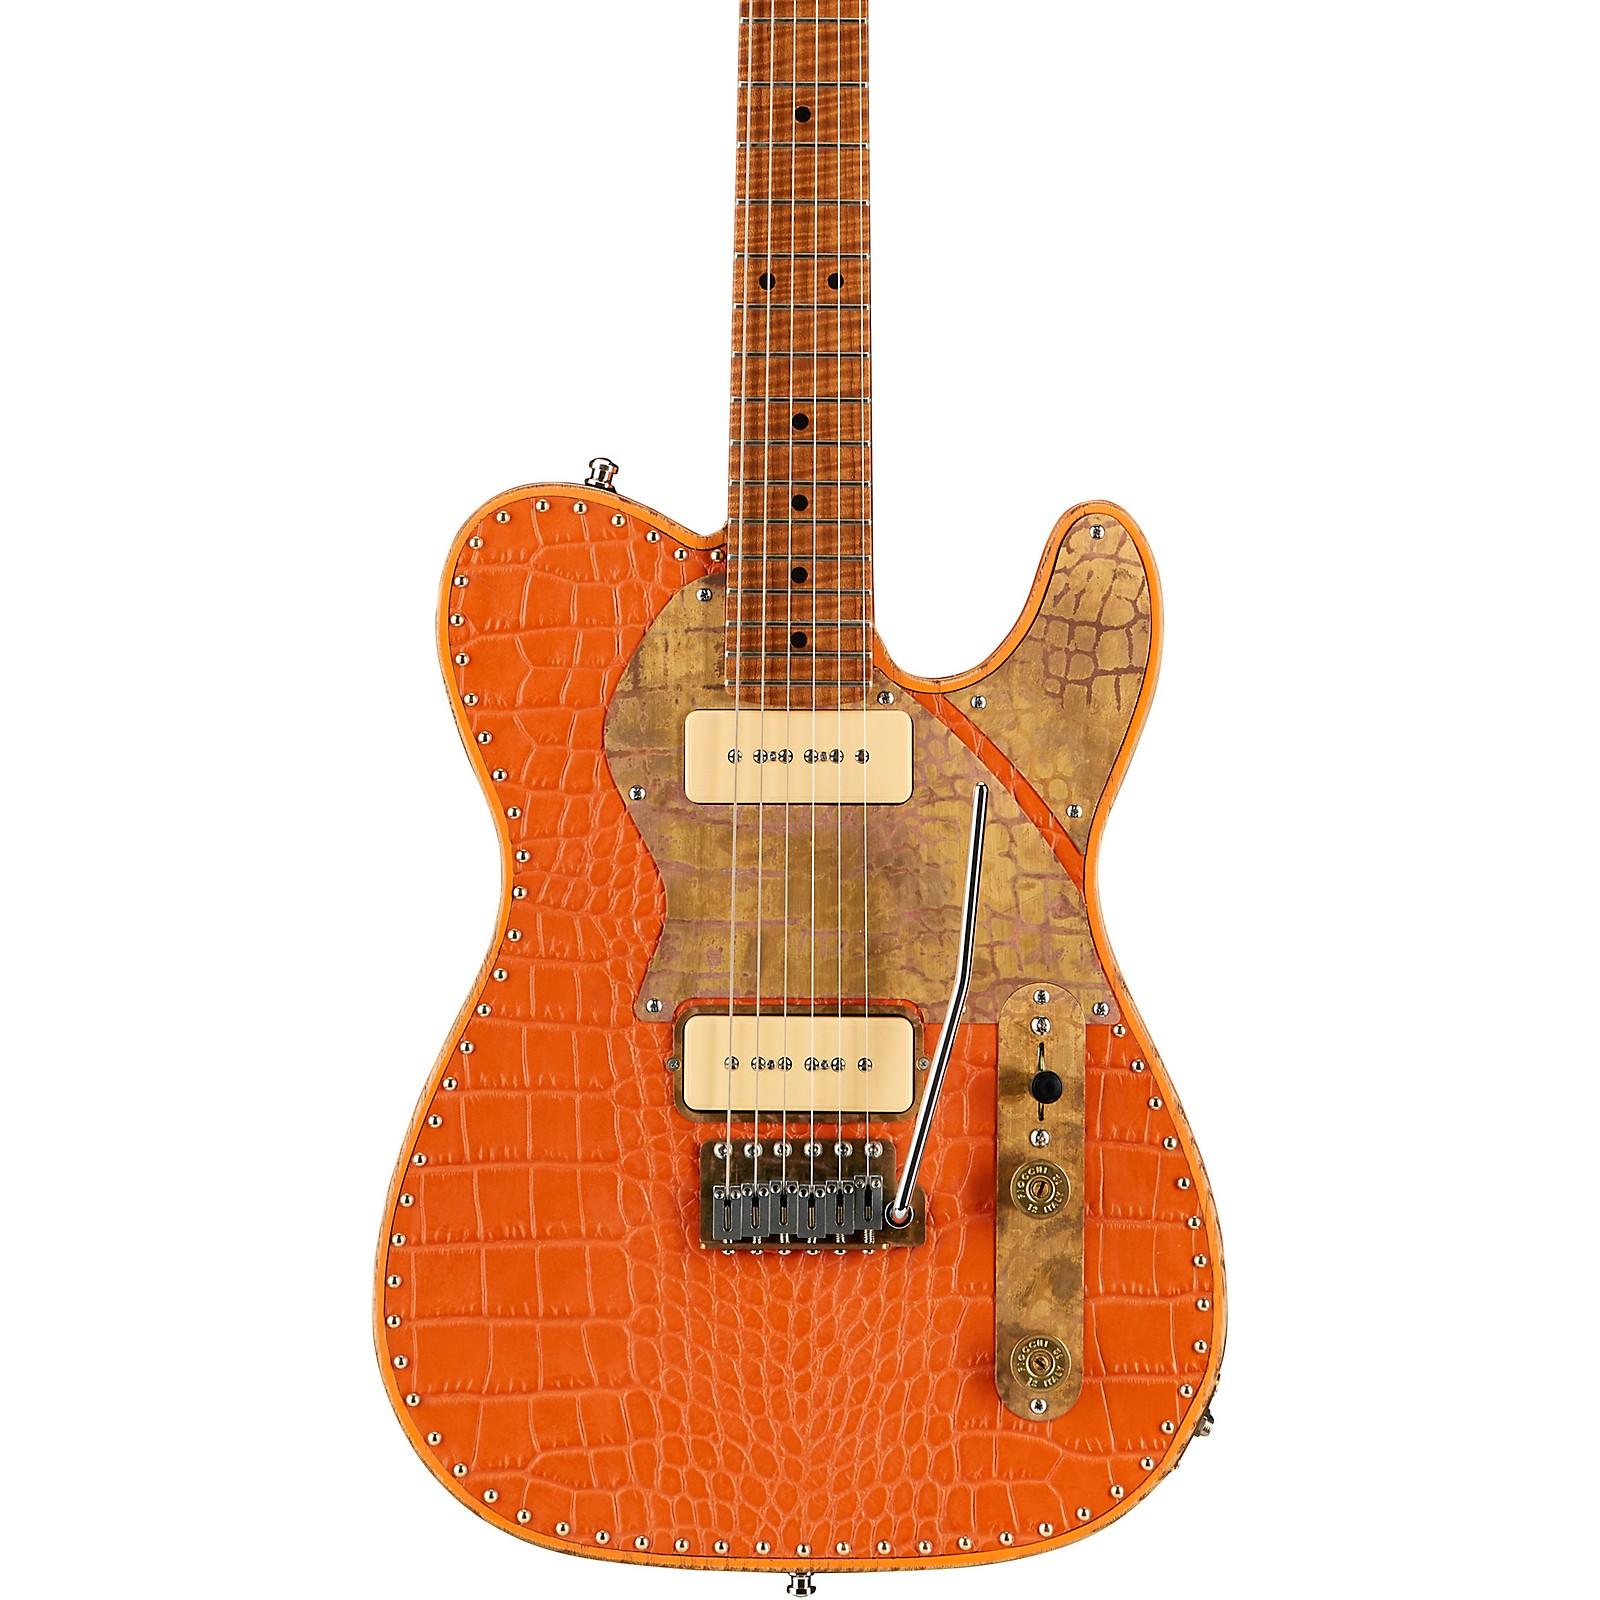 Paoletti Guitars Nancy Leather Top 2 P-90 Electric Guitar